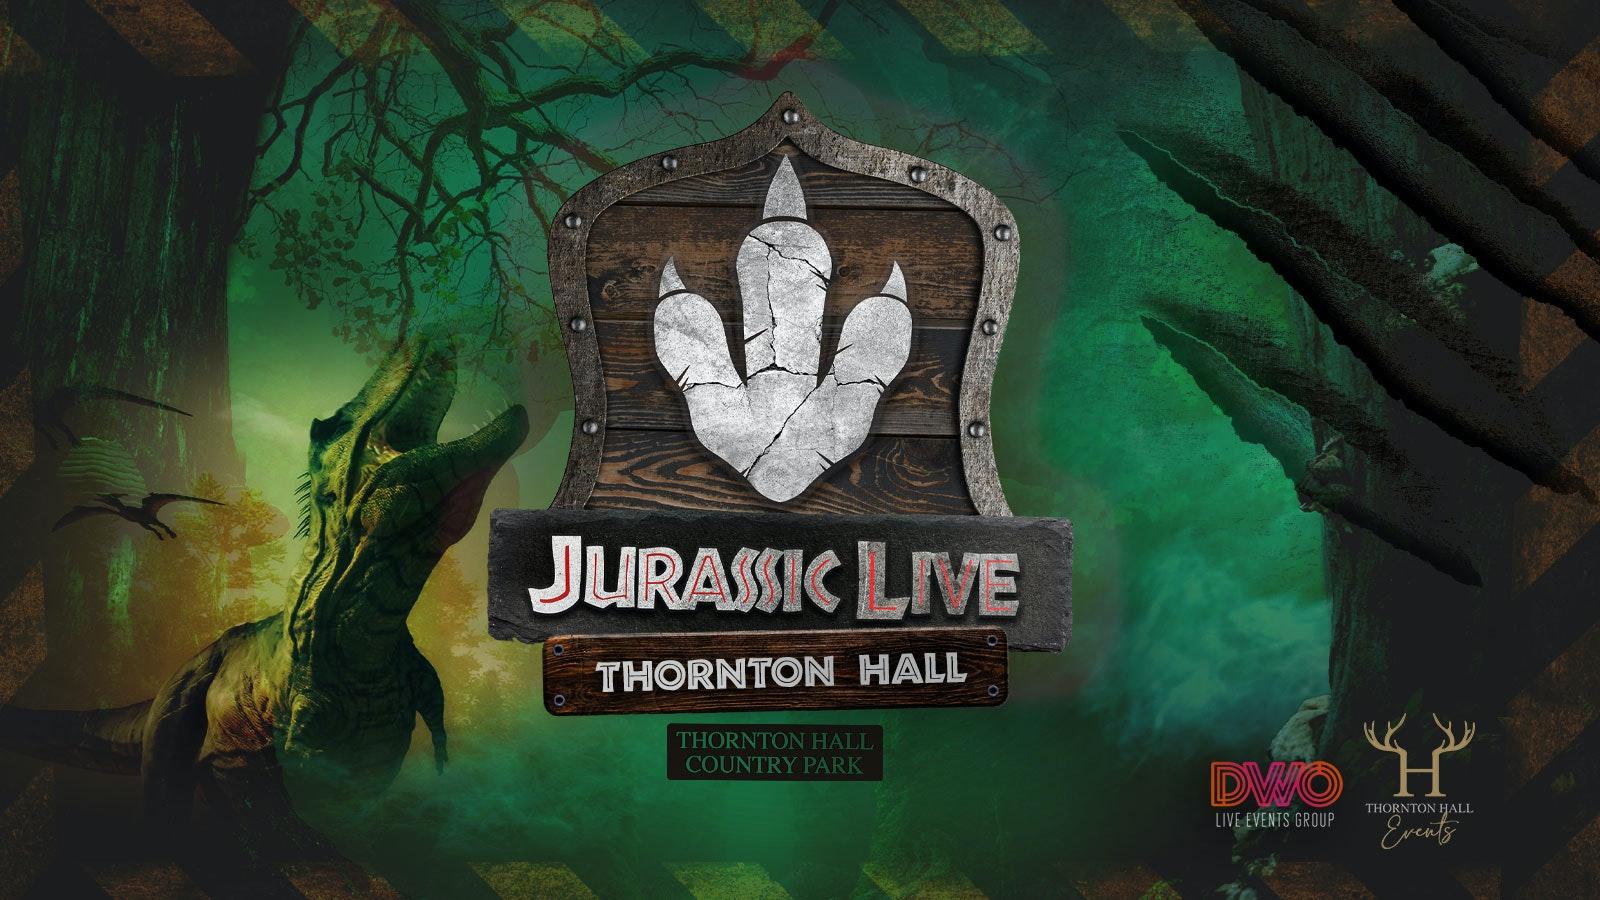 Jurassic Live – Monday 29th March – 2pm